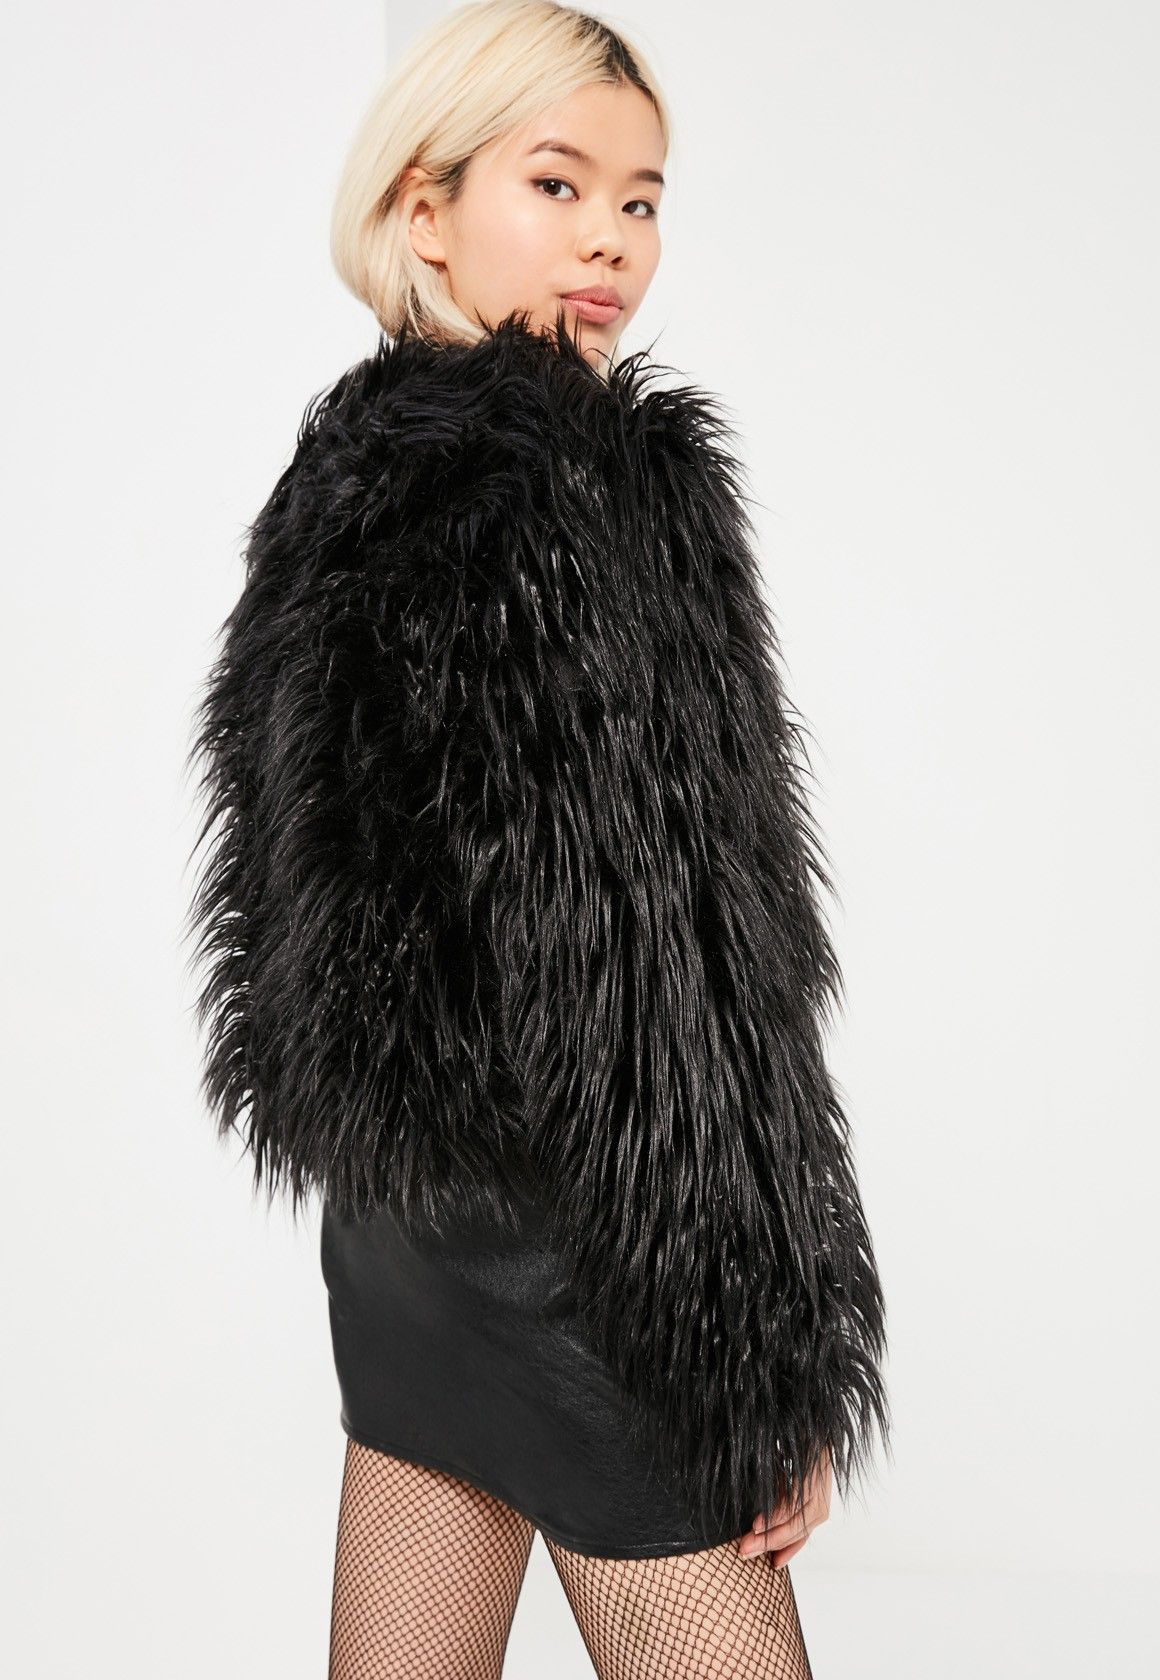 ace0b6e7c50dd Black Mongolian Faux Fur Coat - Missguided | Fashion | Pinterest ...